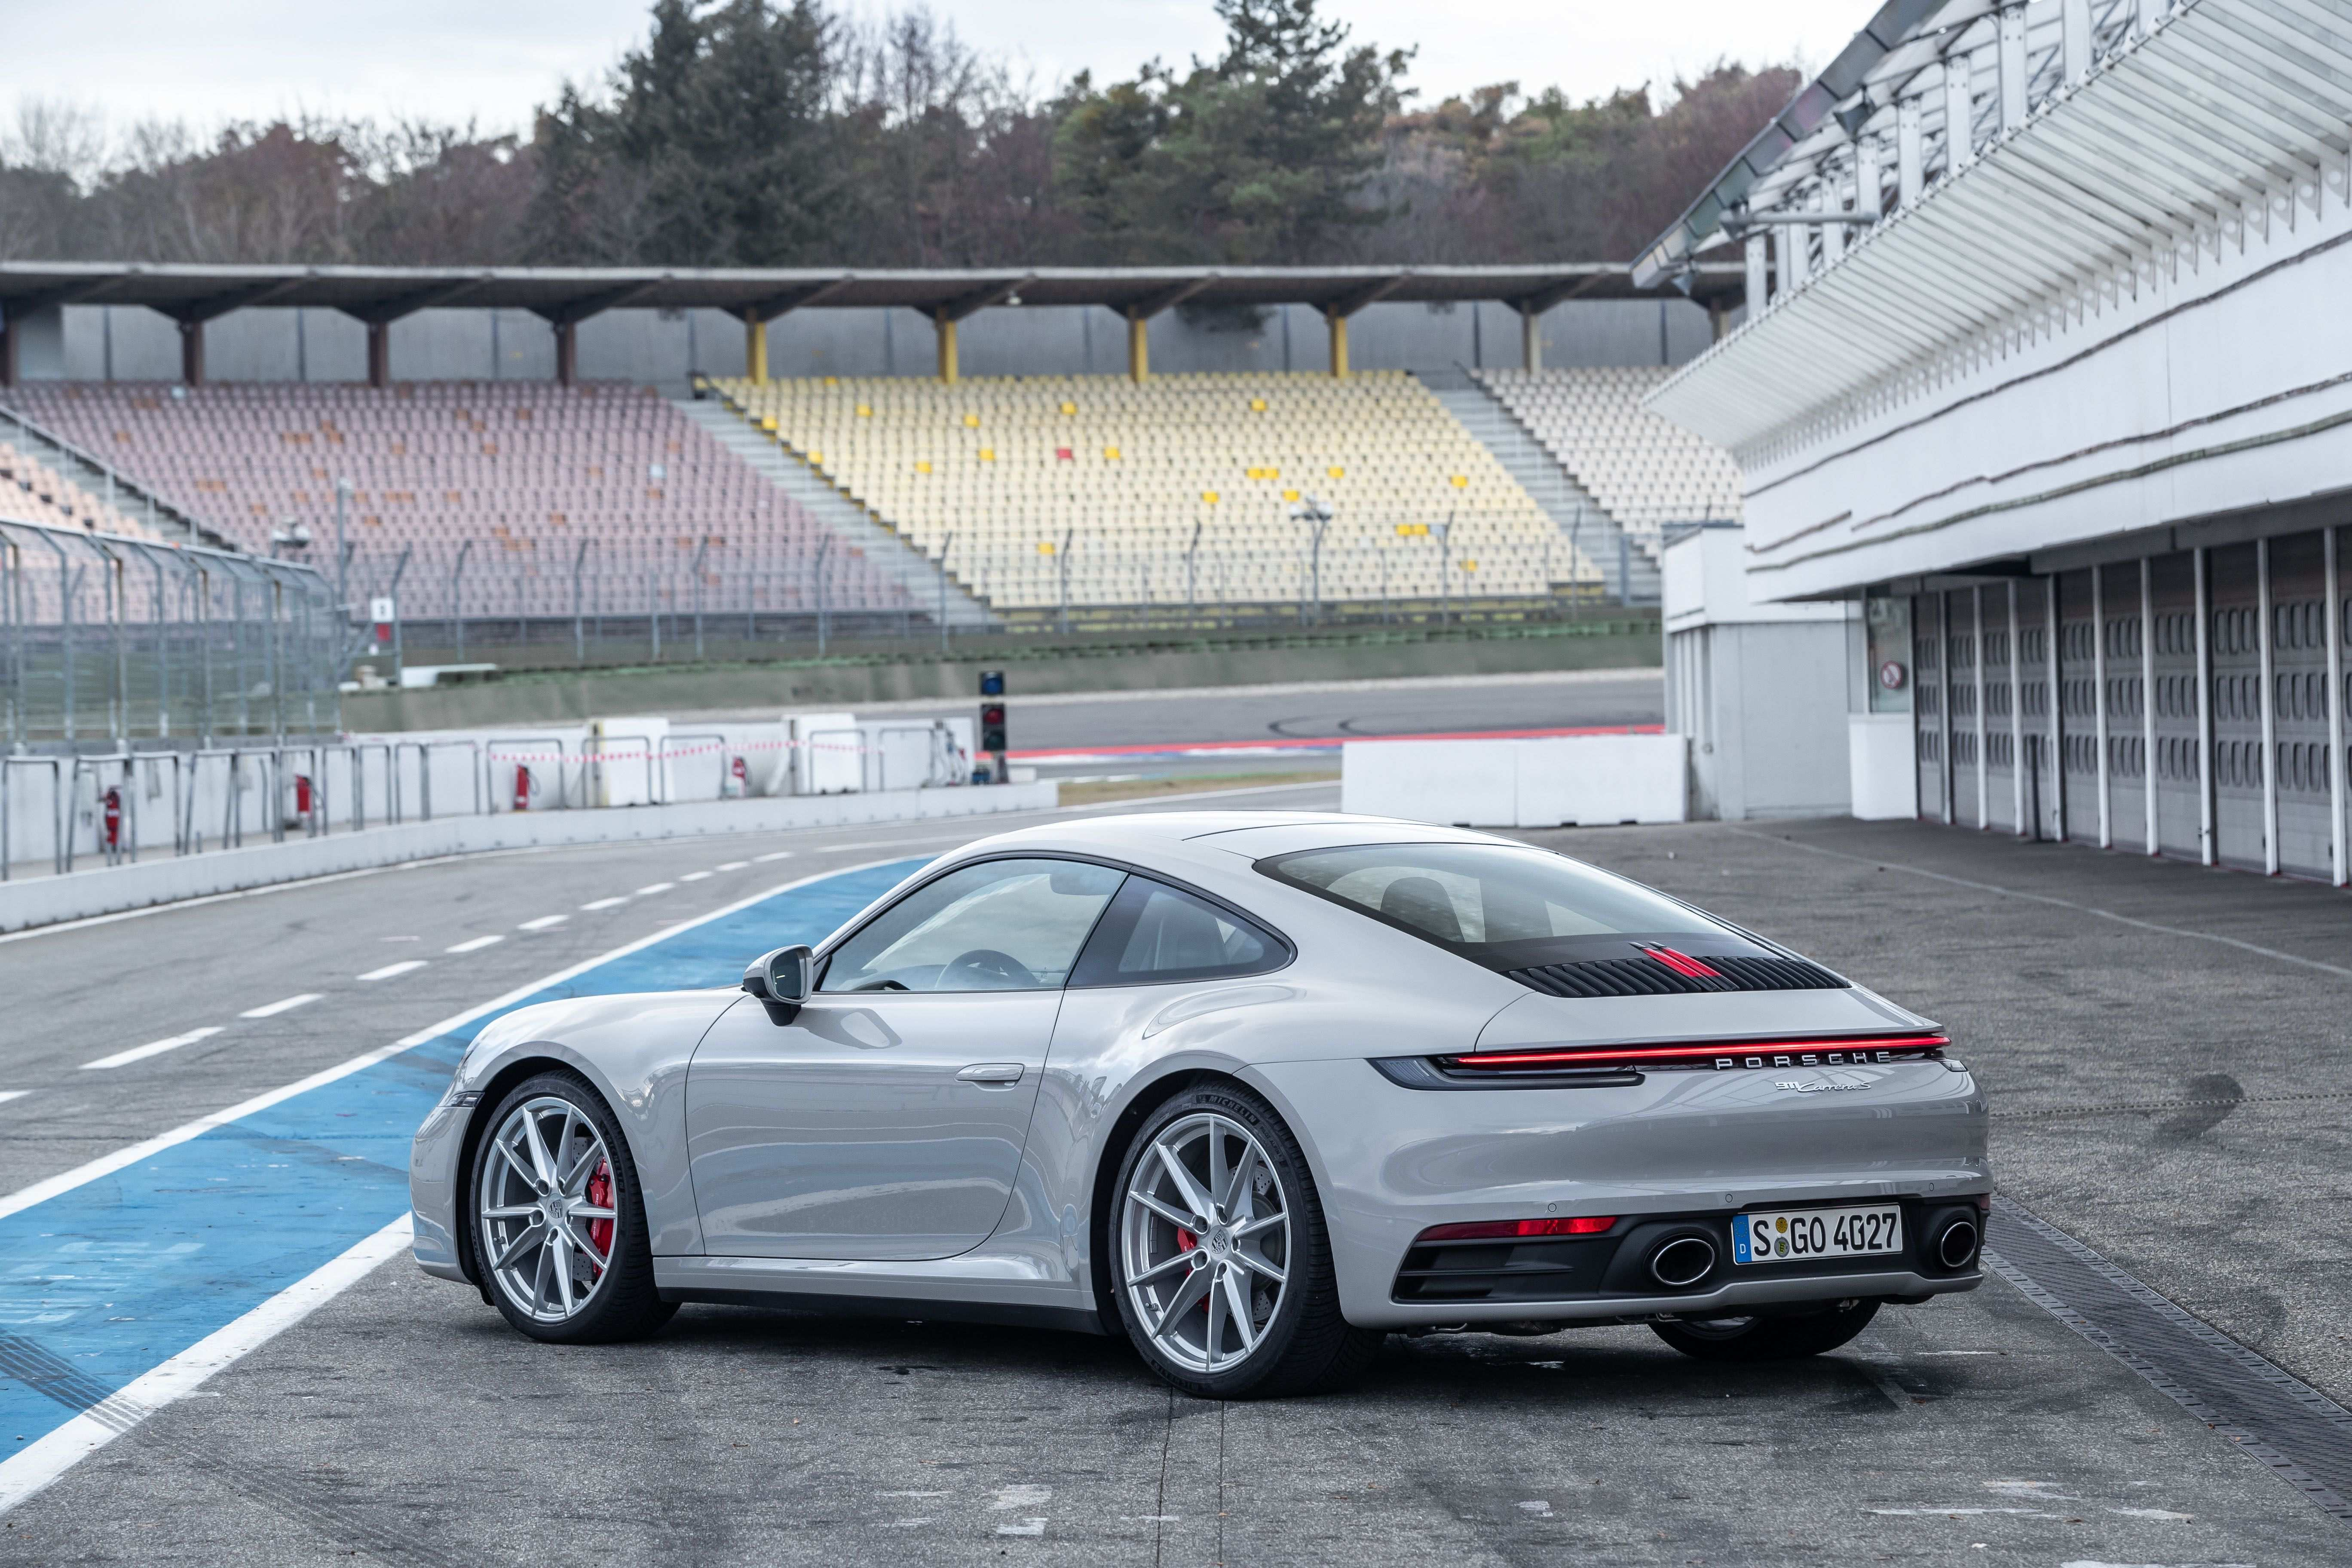 41 New 2020 Porsche 911 Research New by 2020 Porsche 911